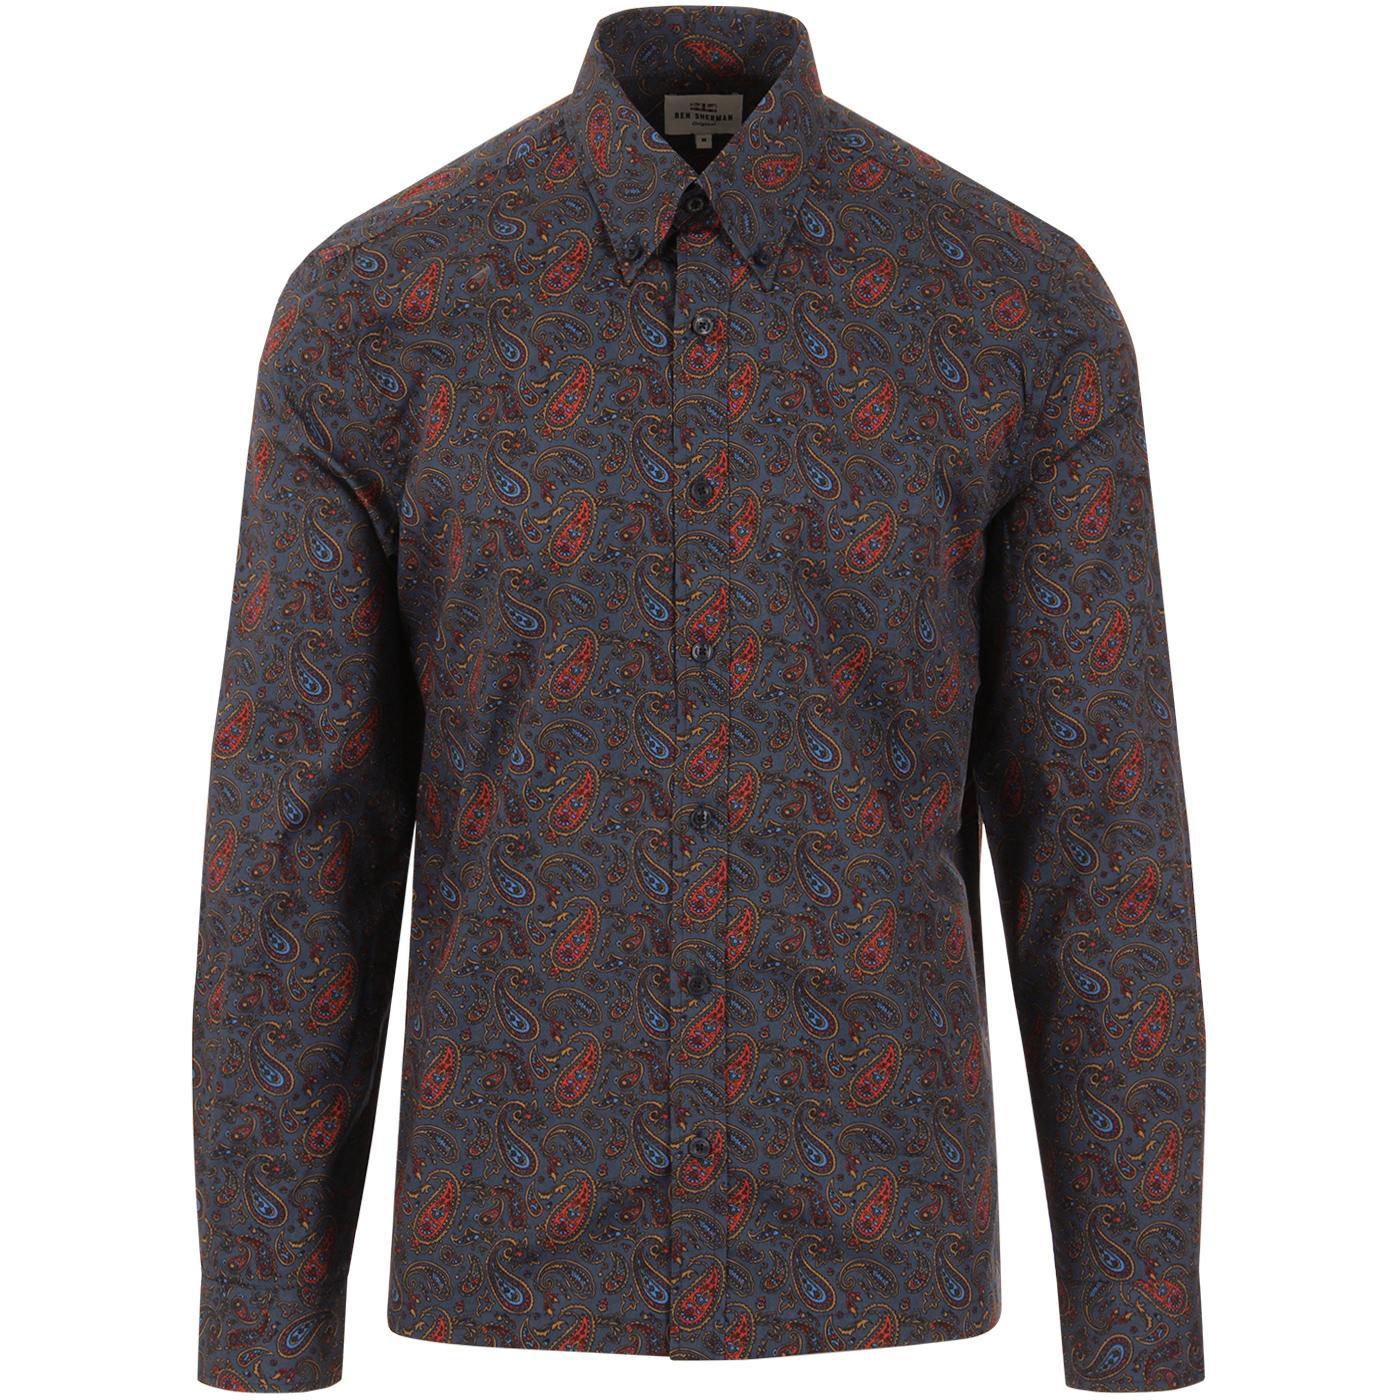 BEN SHERMAN 60s Mod Classic Paisley Print Shirt DN